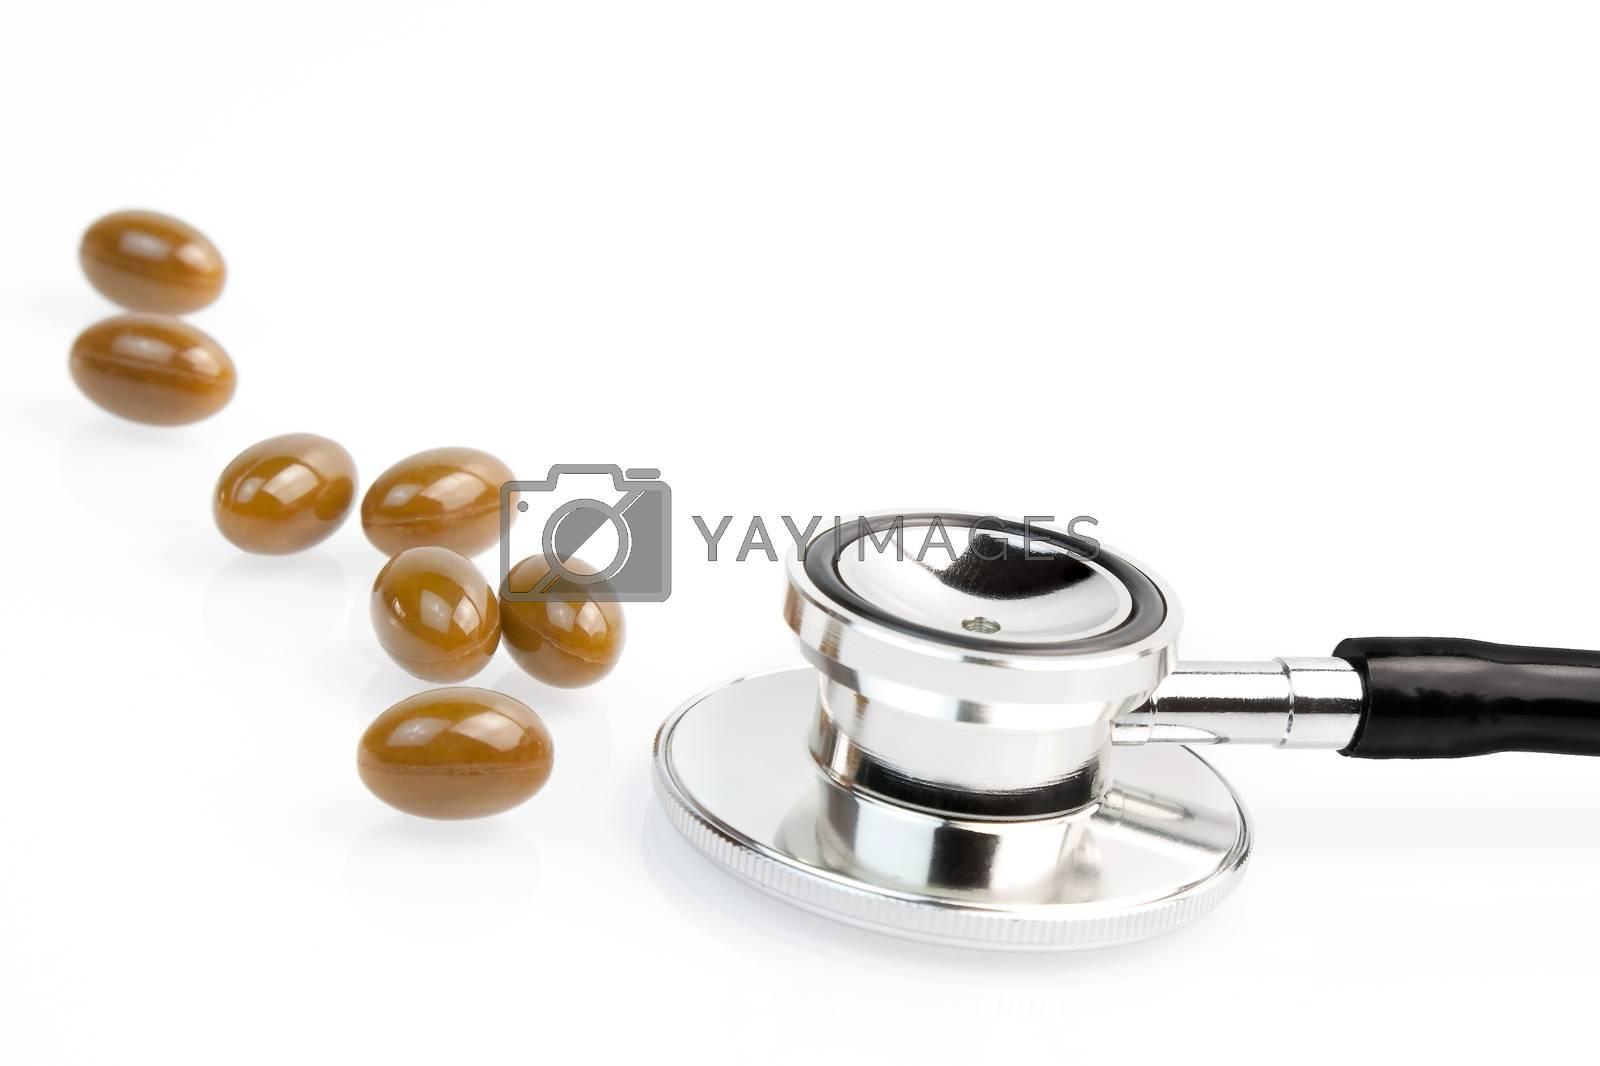 medical pills near stethoscope on white background